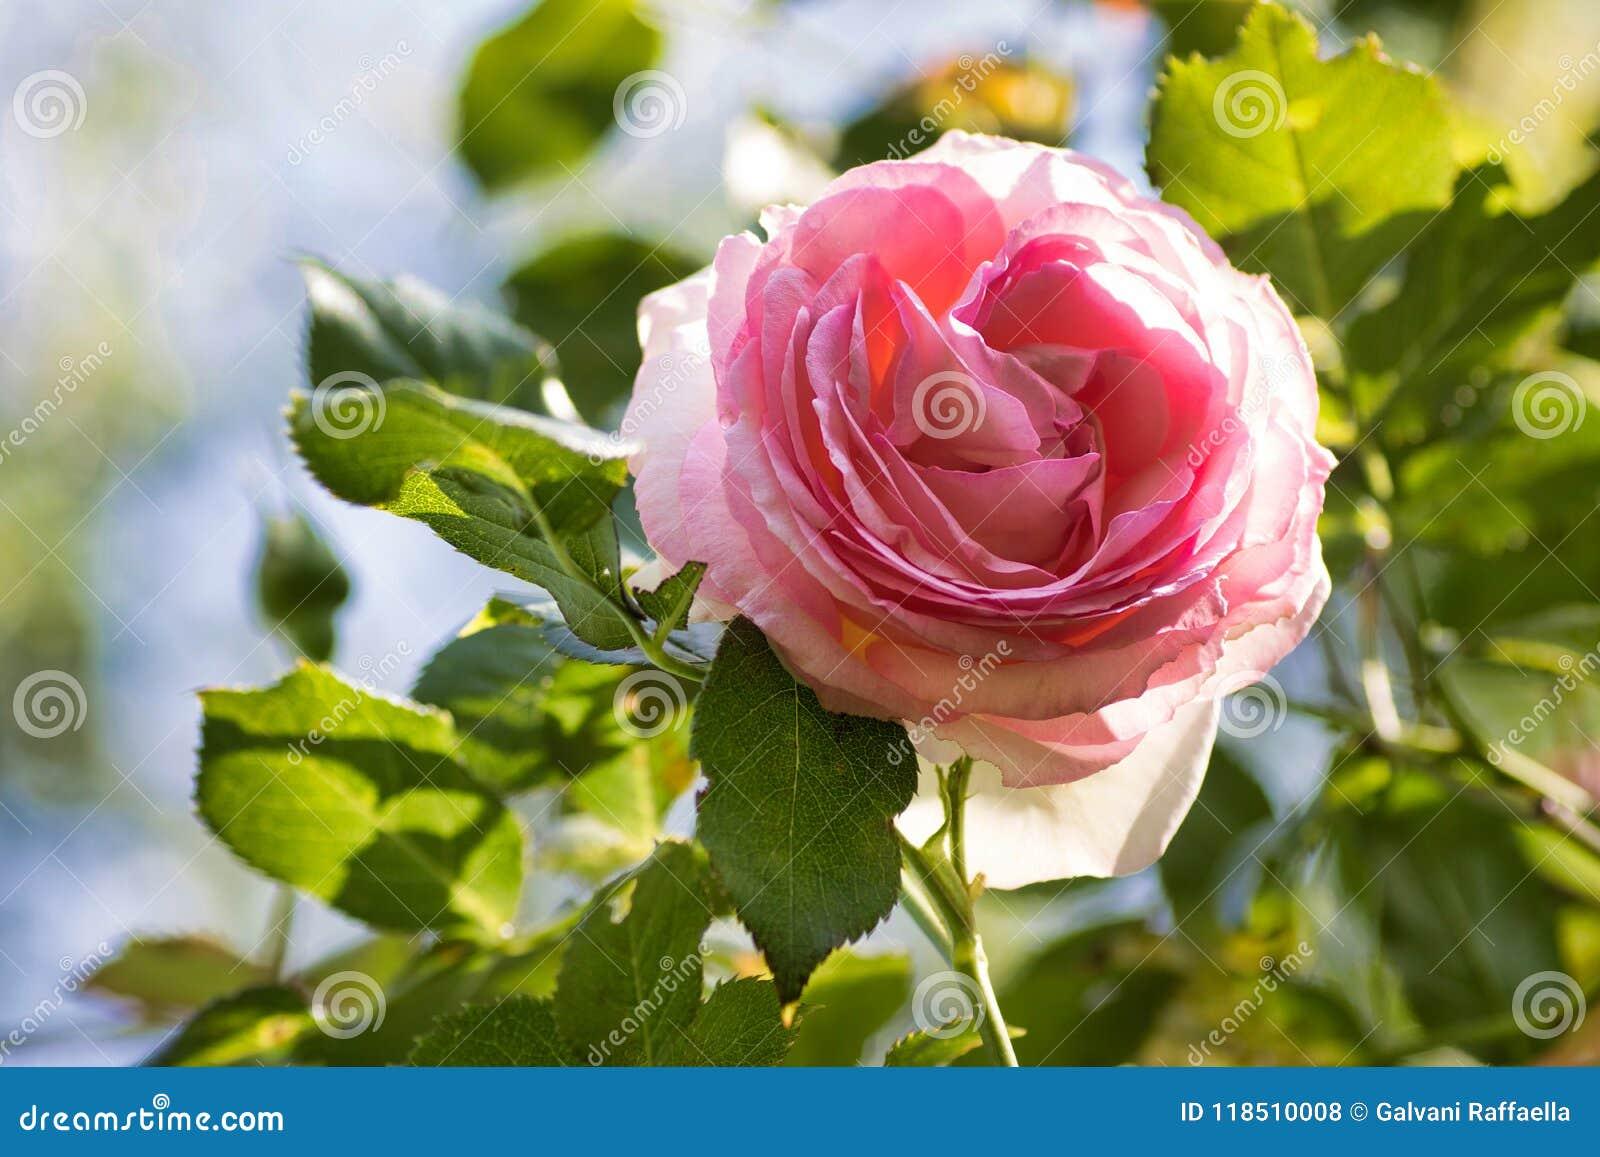 Beautiful Climbing Rose Pierre De Ronsard In Bloom Stock